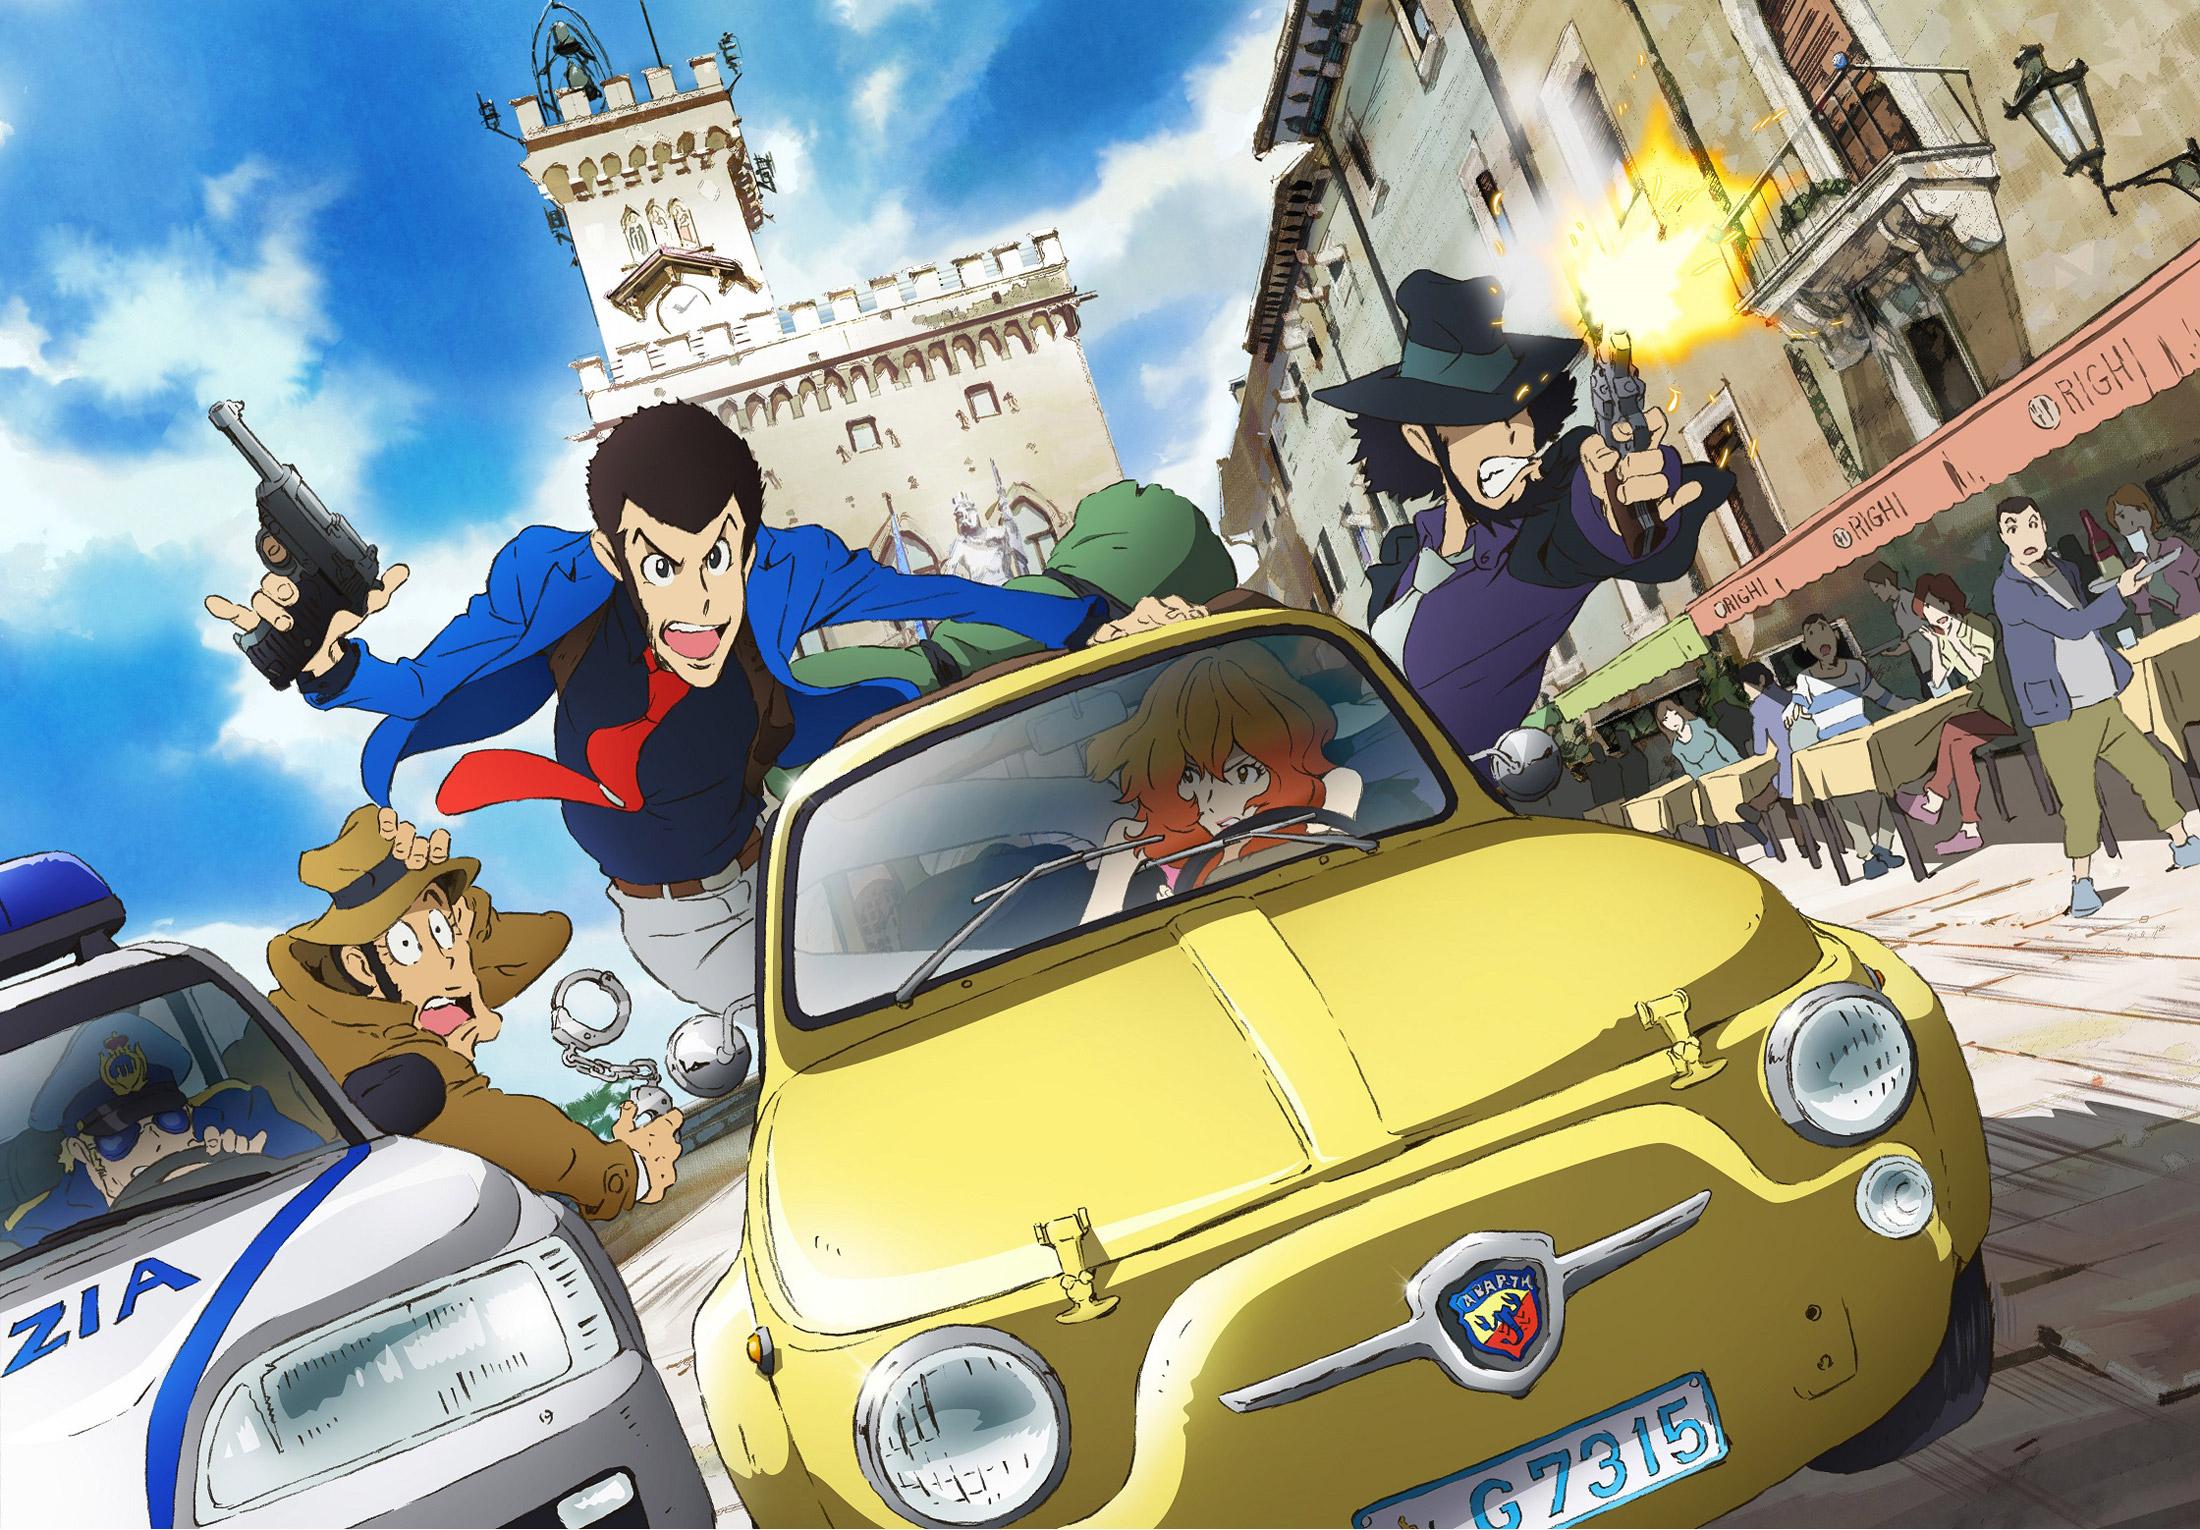 Lupin III Anime Visual Revealed